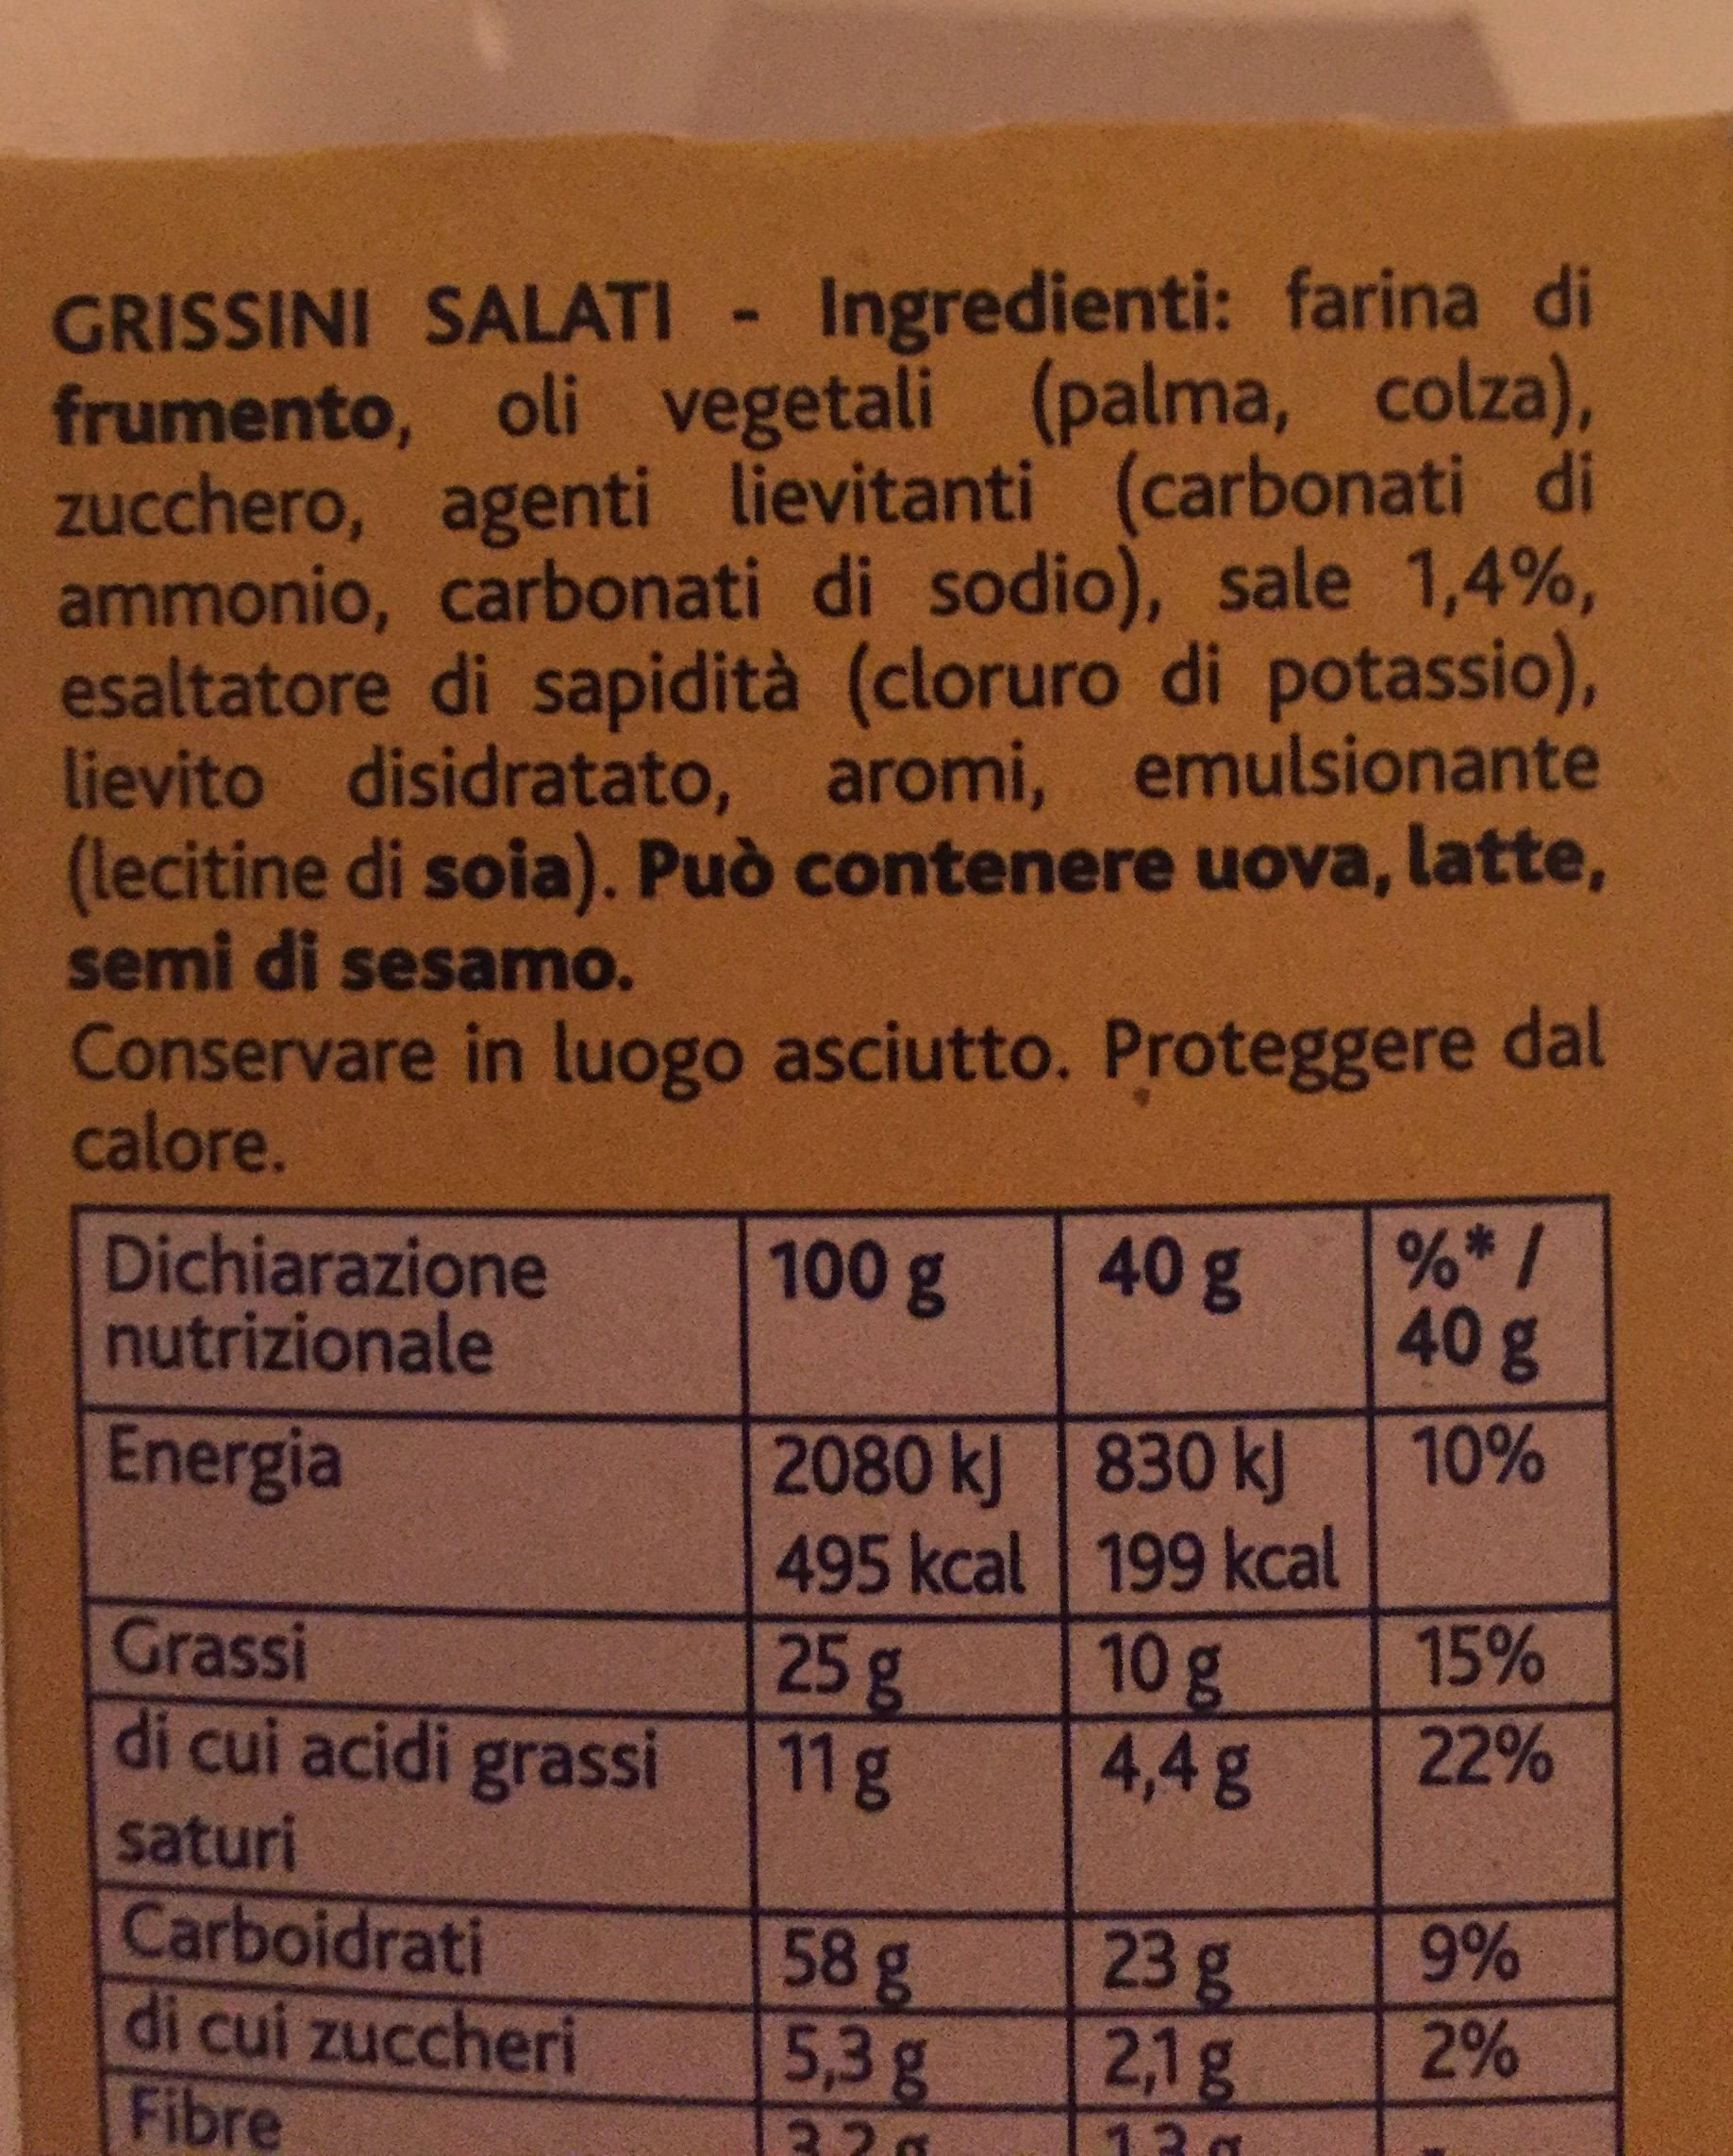 Tuc Stick Grissini Portabili E Gustosi 40g - Ingredienti